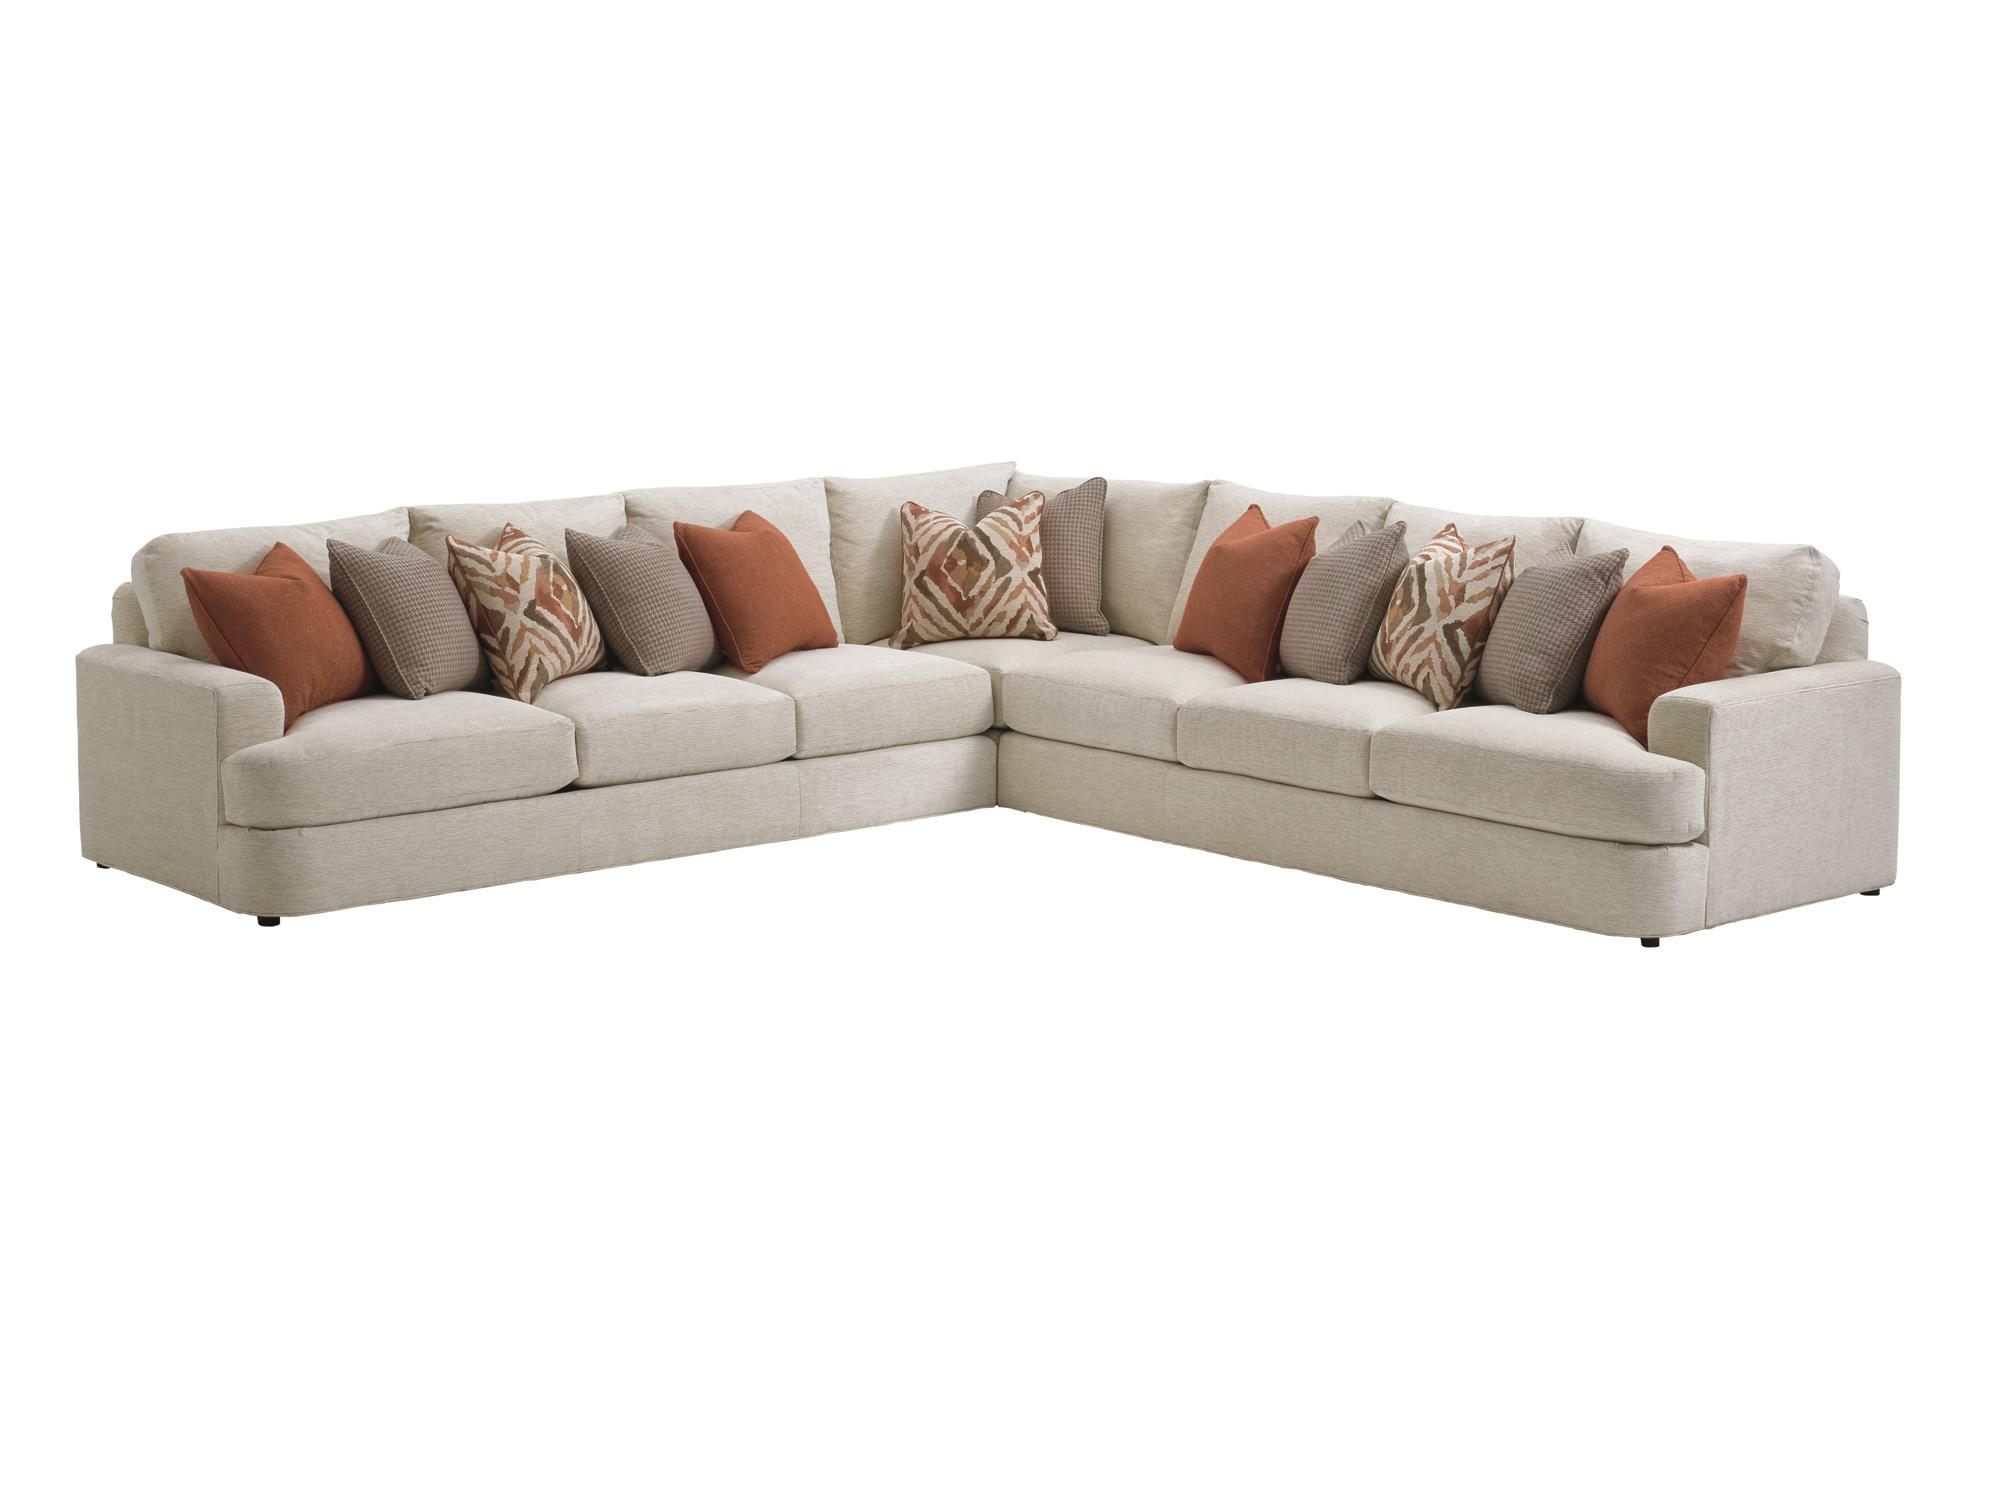 LAUREL CANYON Halandale Sectional Sofa by Lexington at Jacksonville Furniture Mart